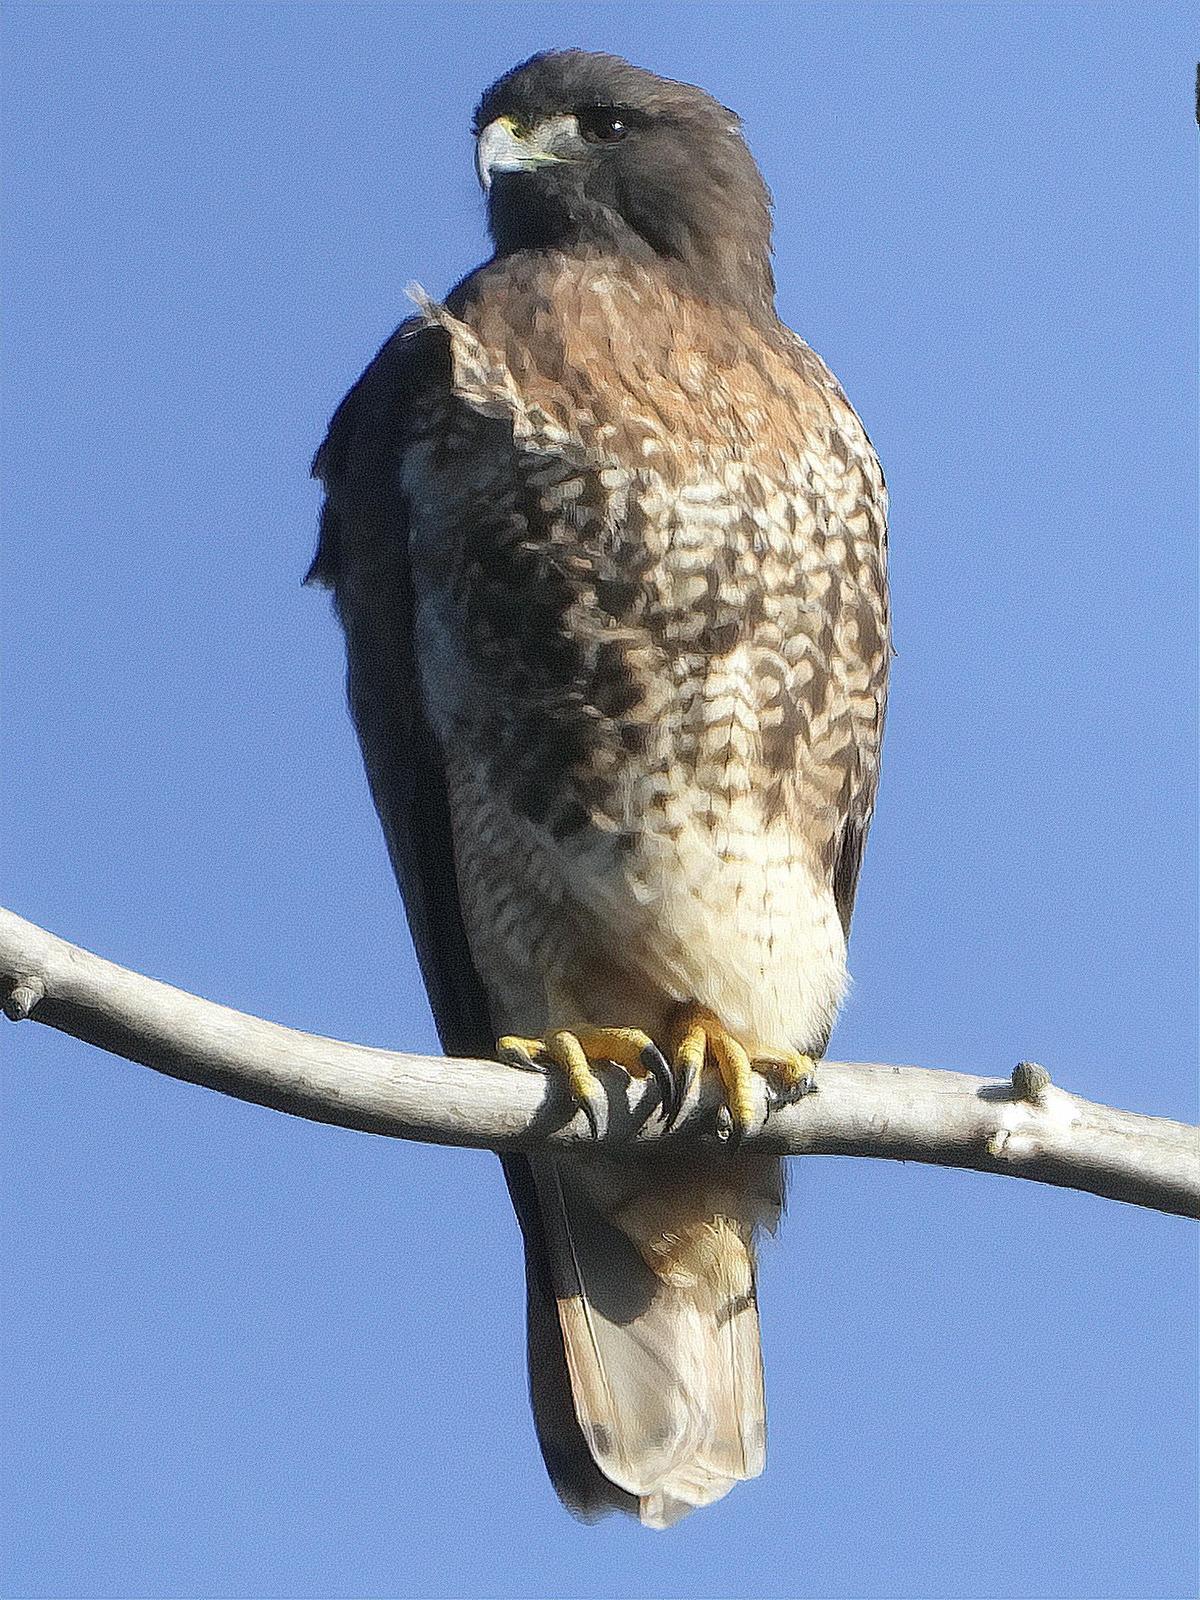 Red-tailed Hawk (calurus/alascensis) Photo by Dan Tallman